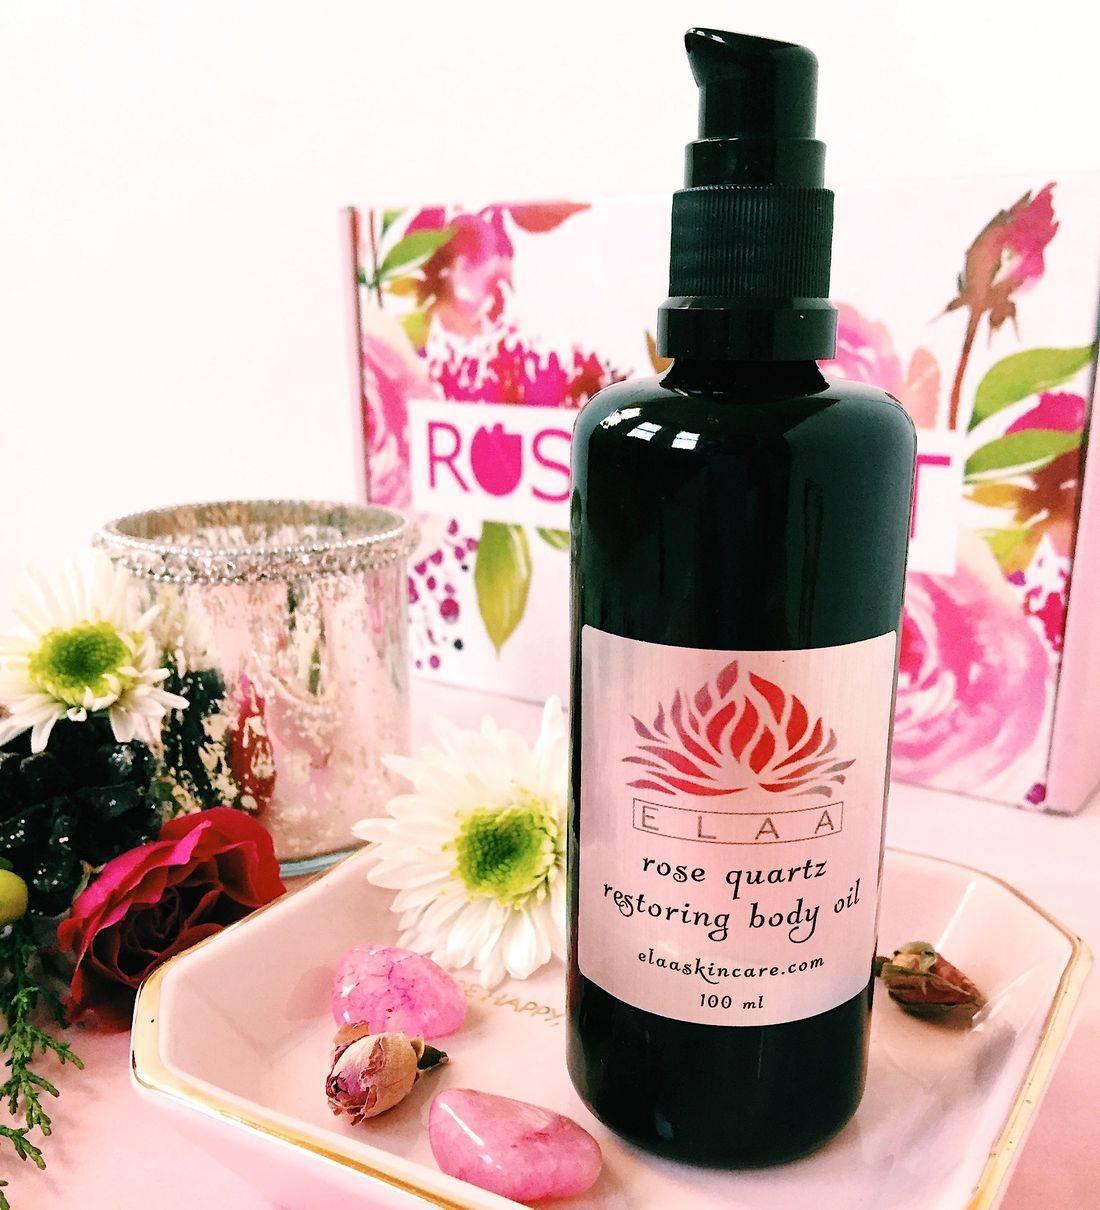 RosePost Box Blog: Discovering Elaa Skincare